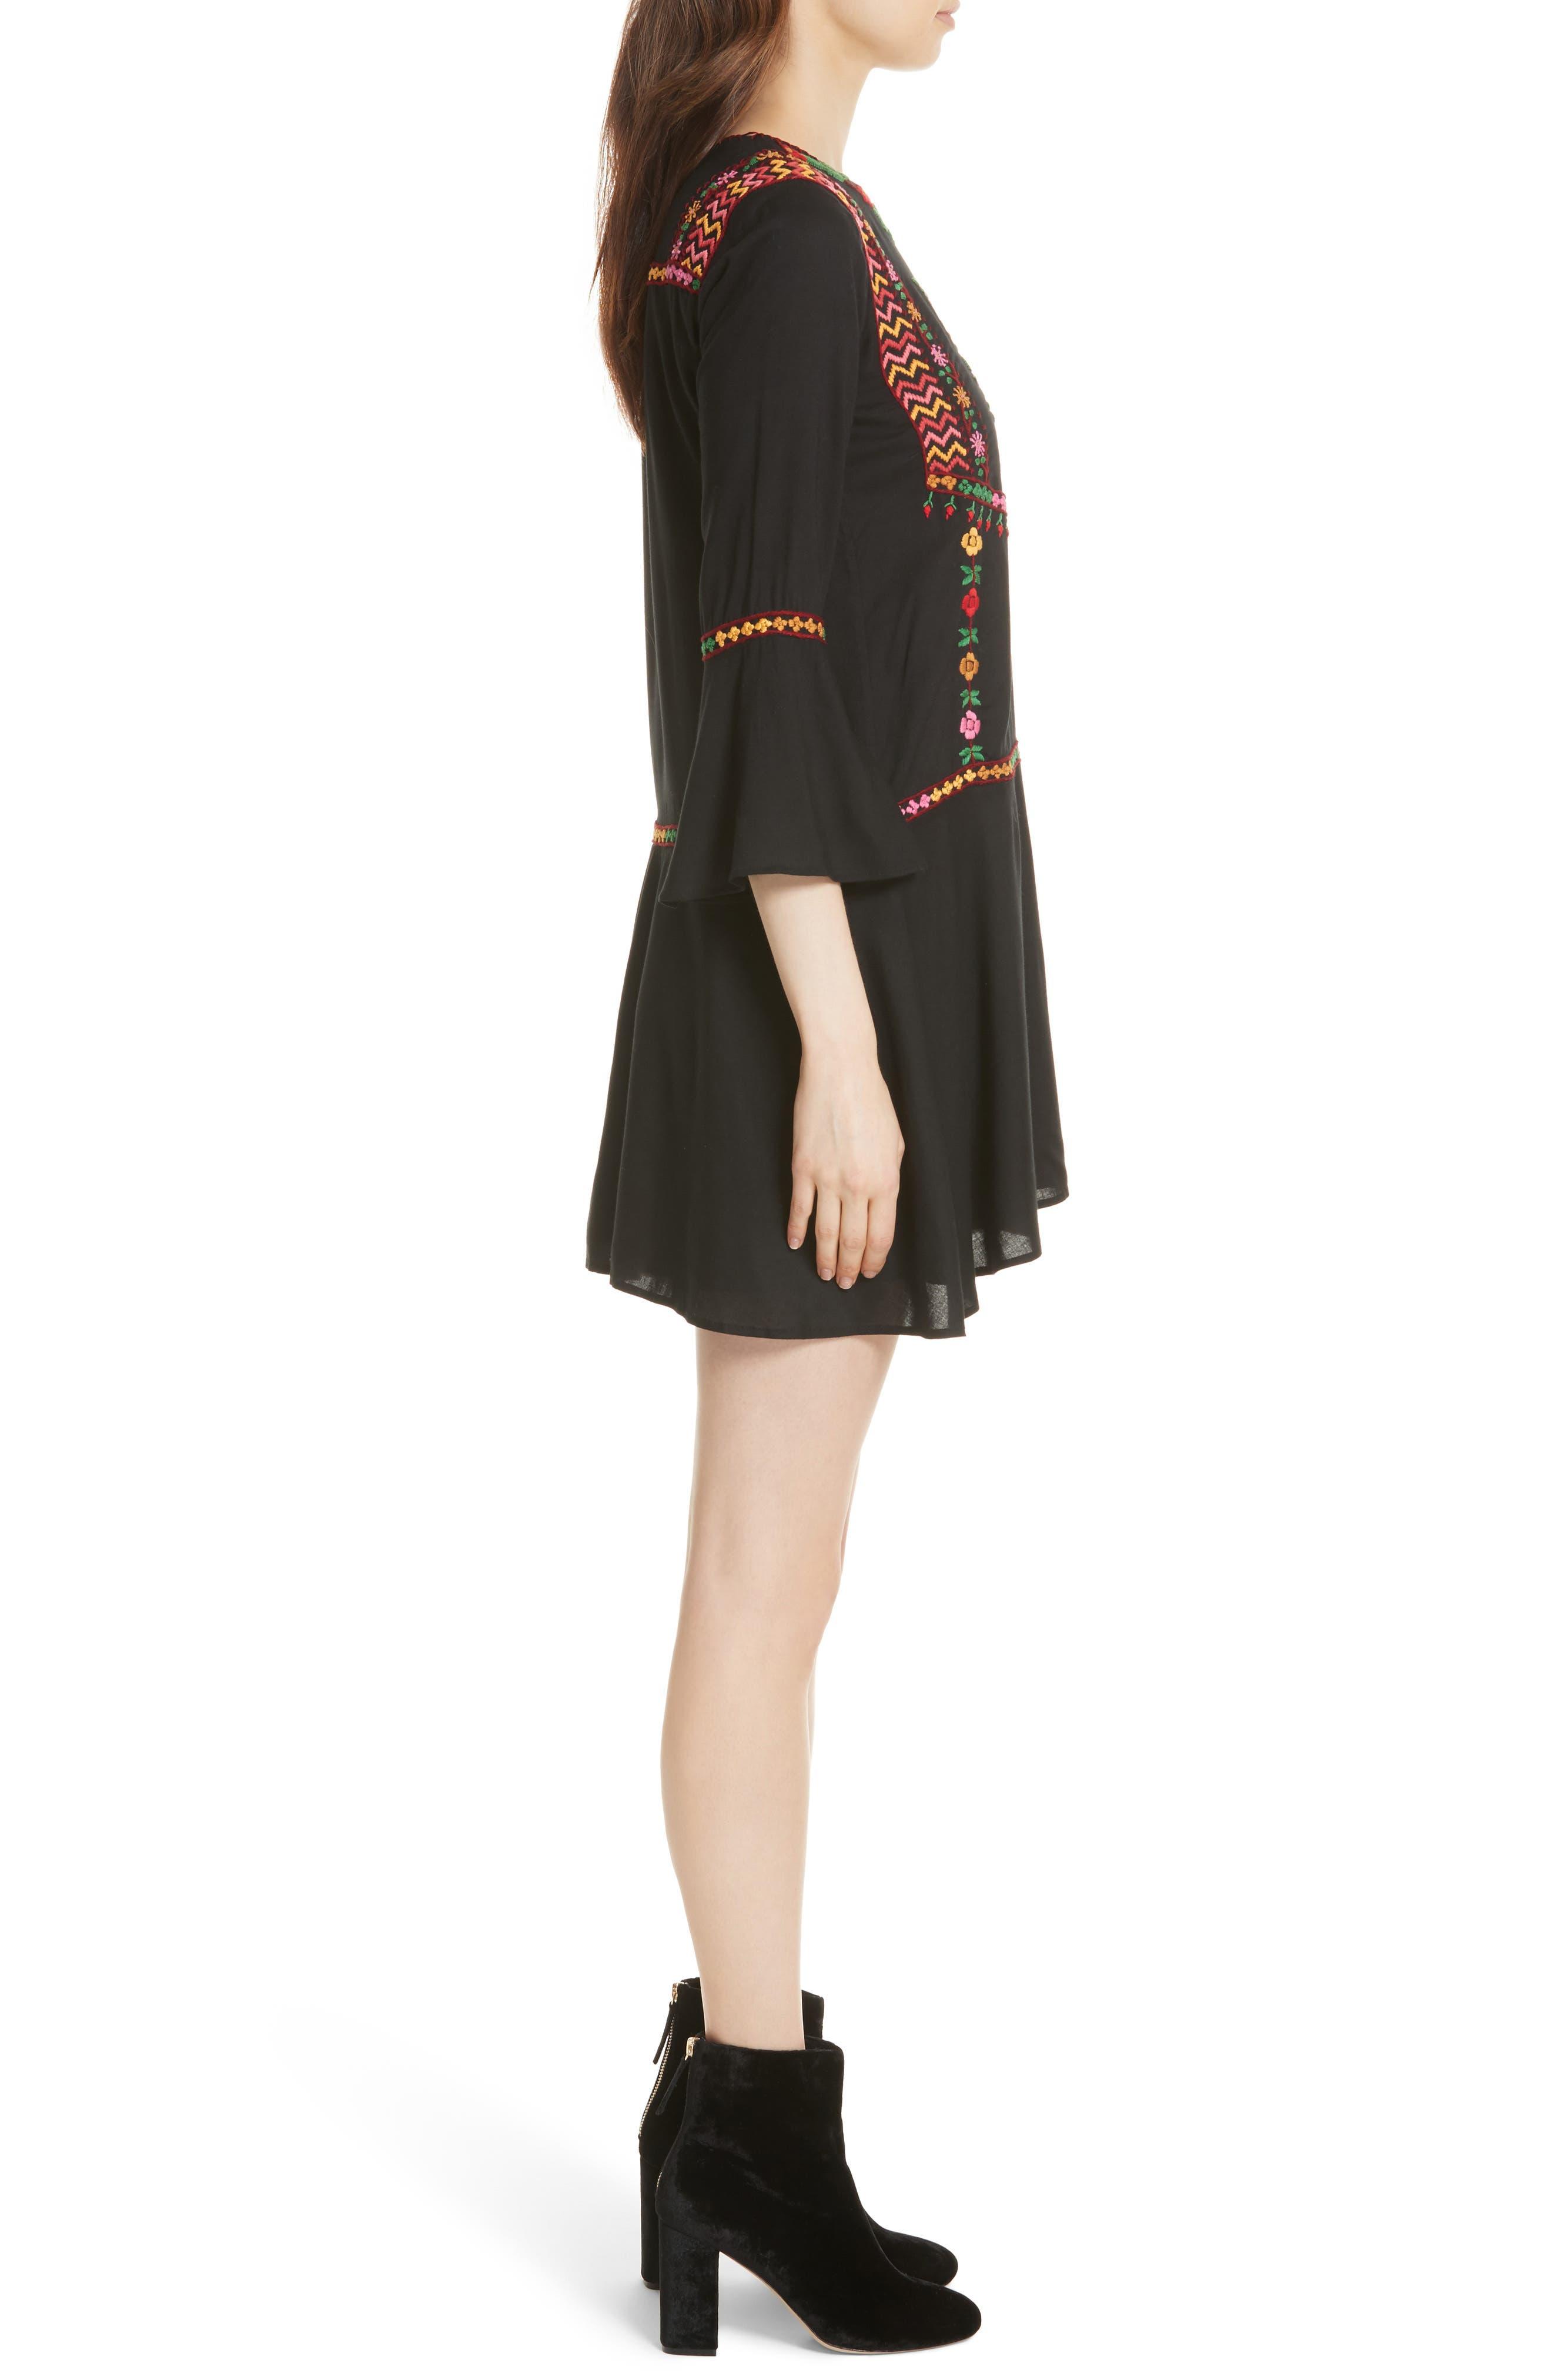 Gosinda Embroidered Dress,                             Alternate thumbnail 3, color,                             Caviar/ Multi